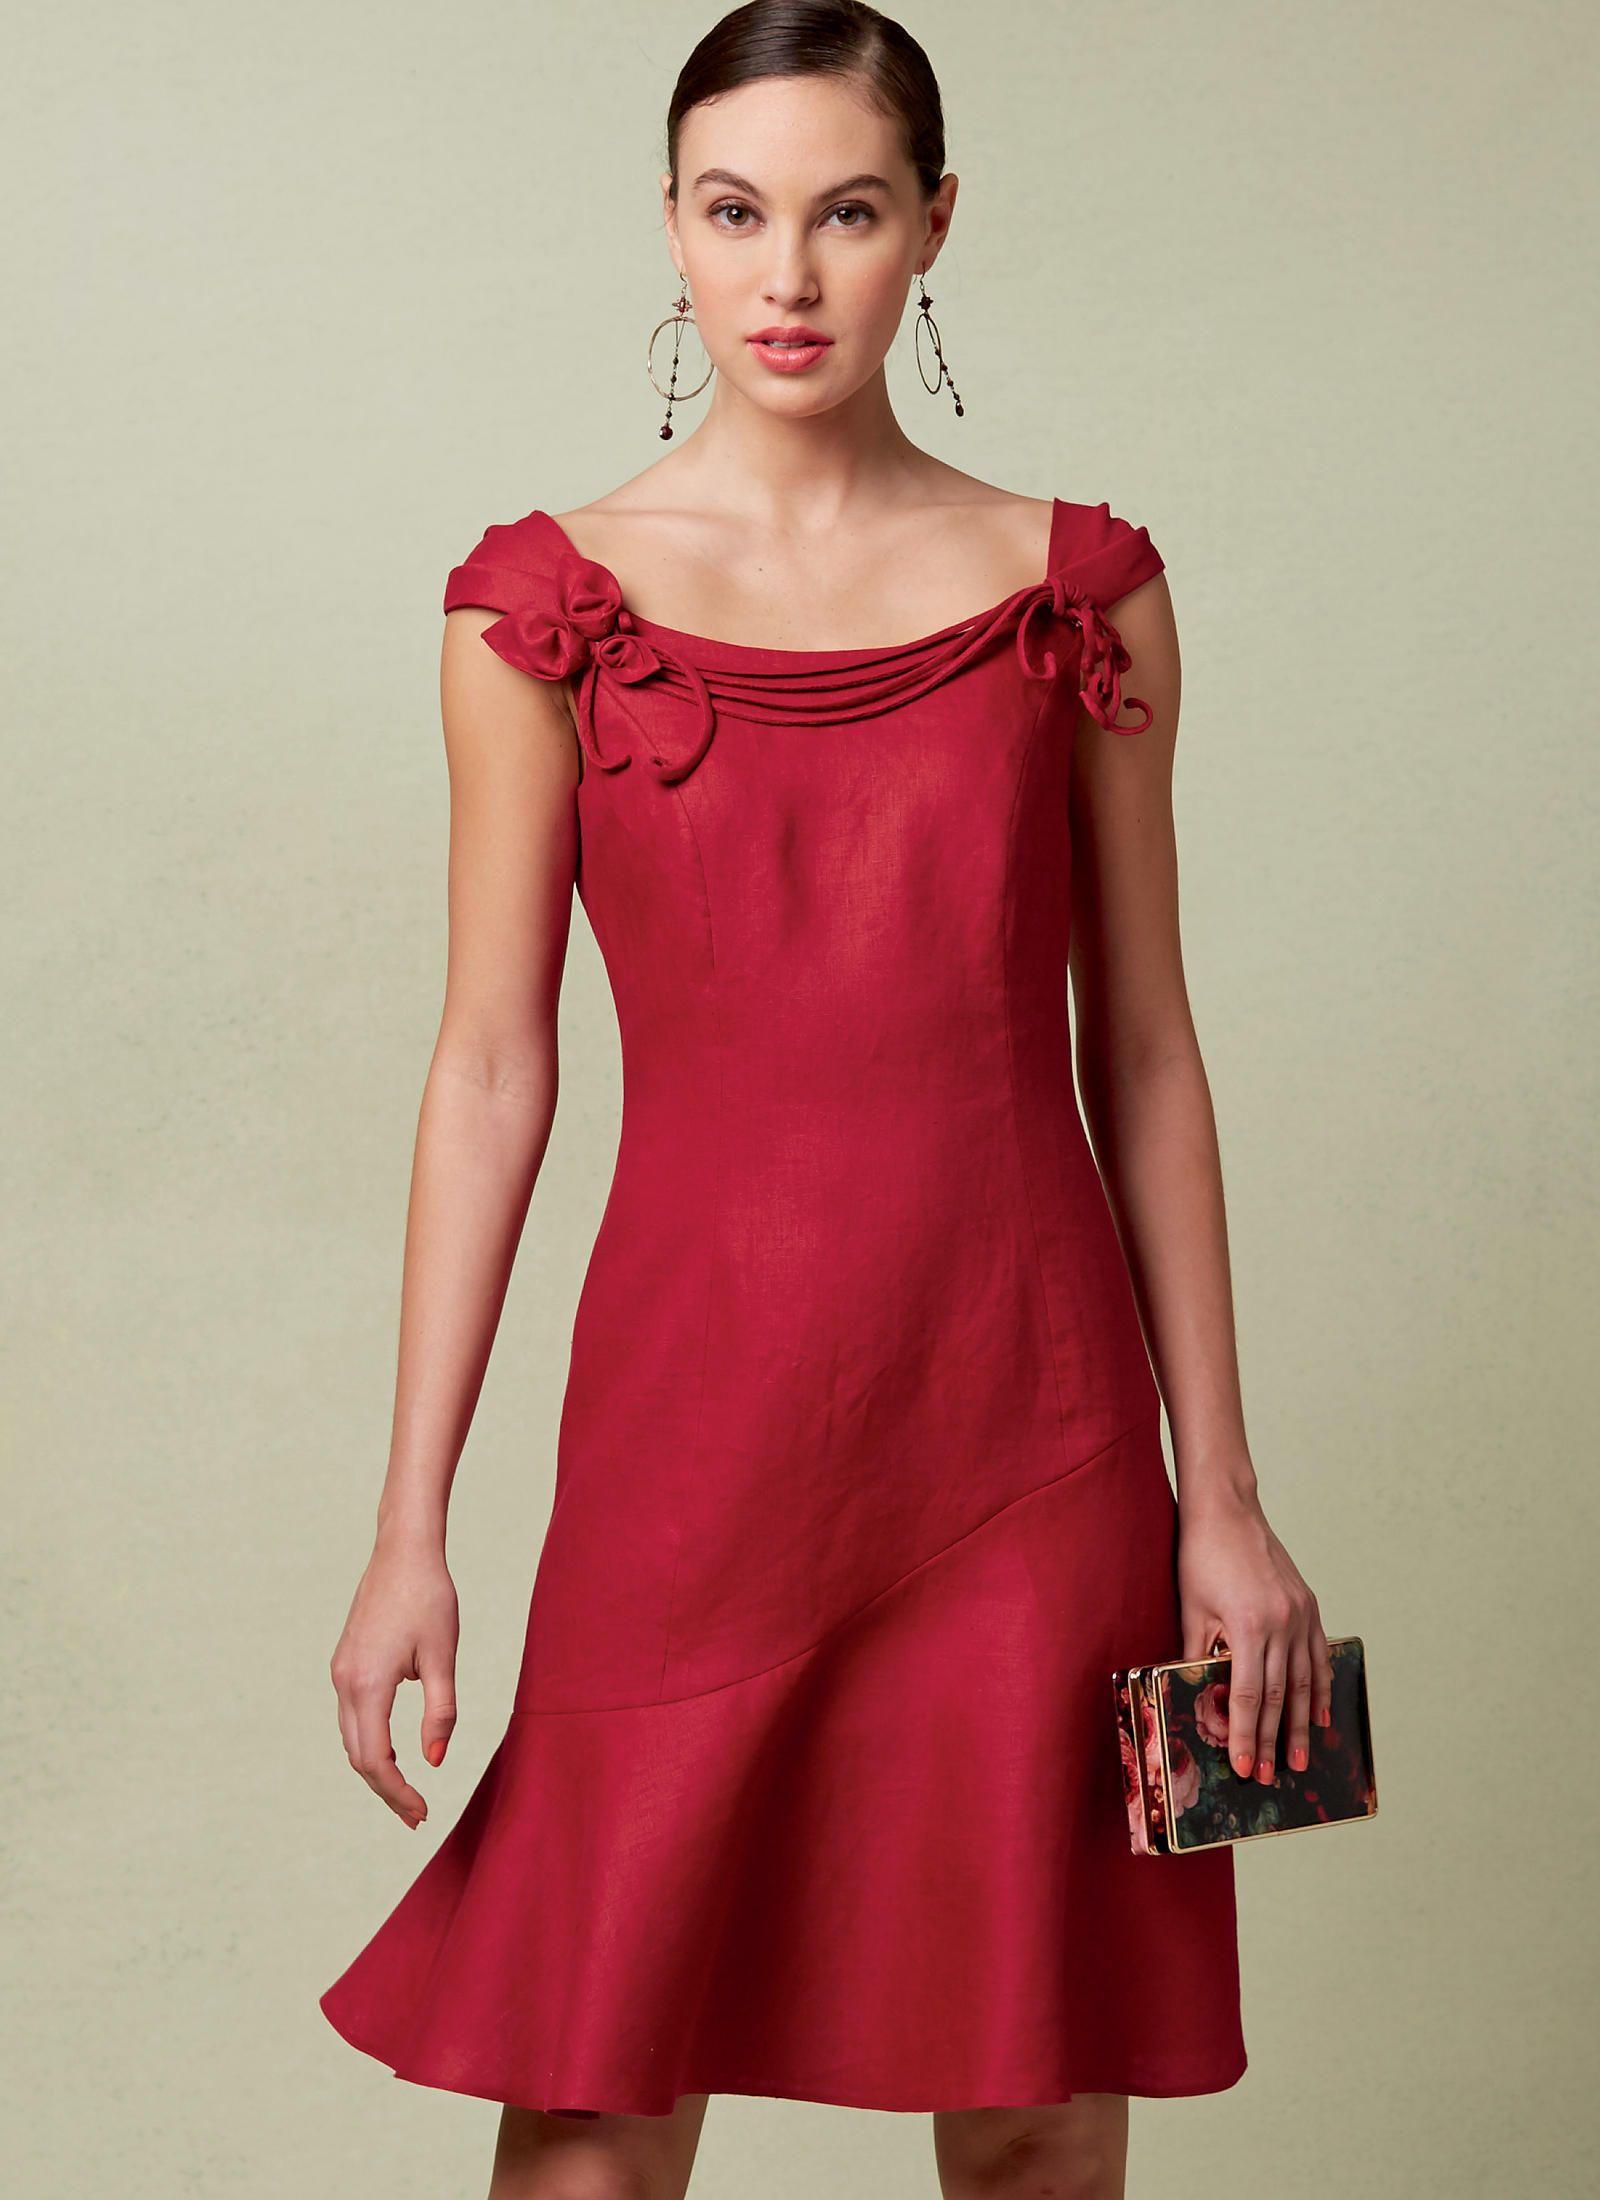 V1542 | Vogue Patterns | Sewing Patterns | Pattern Me Pretty ...